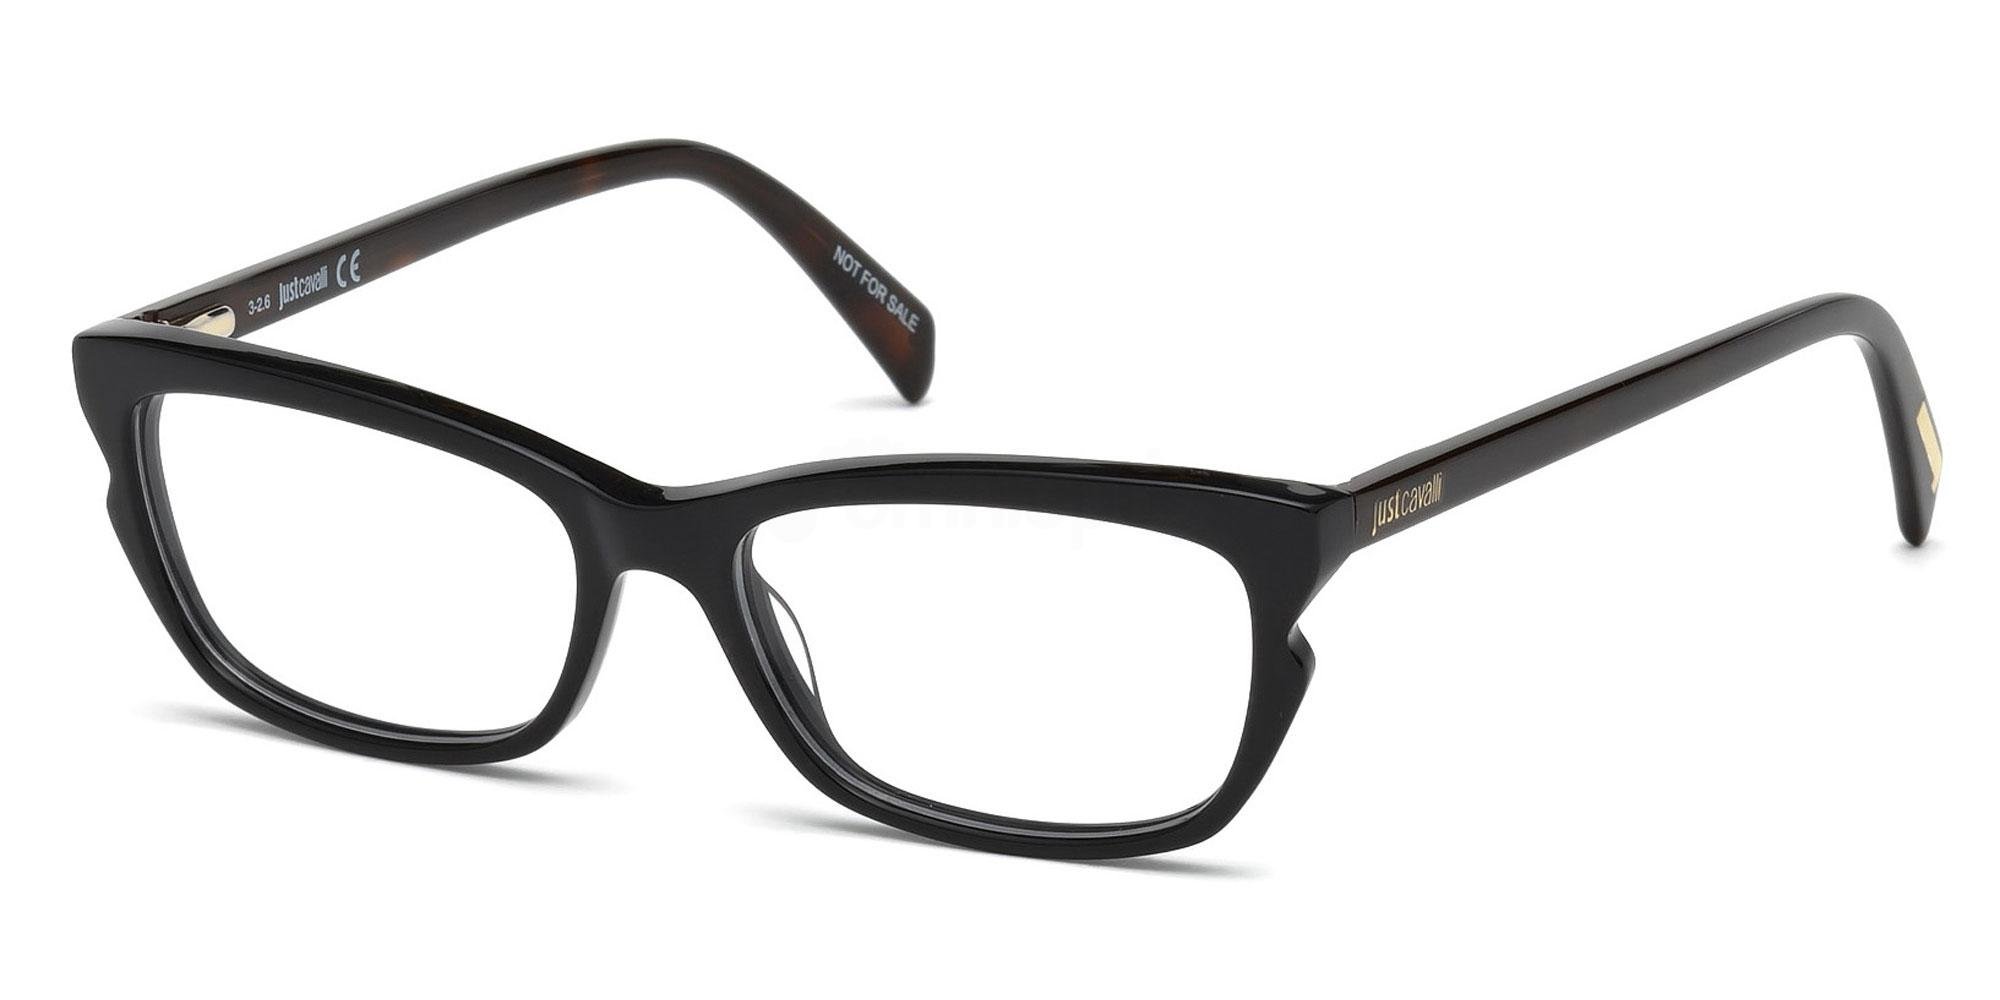 001 JC0797 Glasses, Just Cavalli